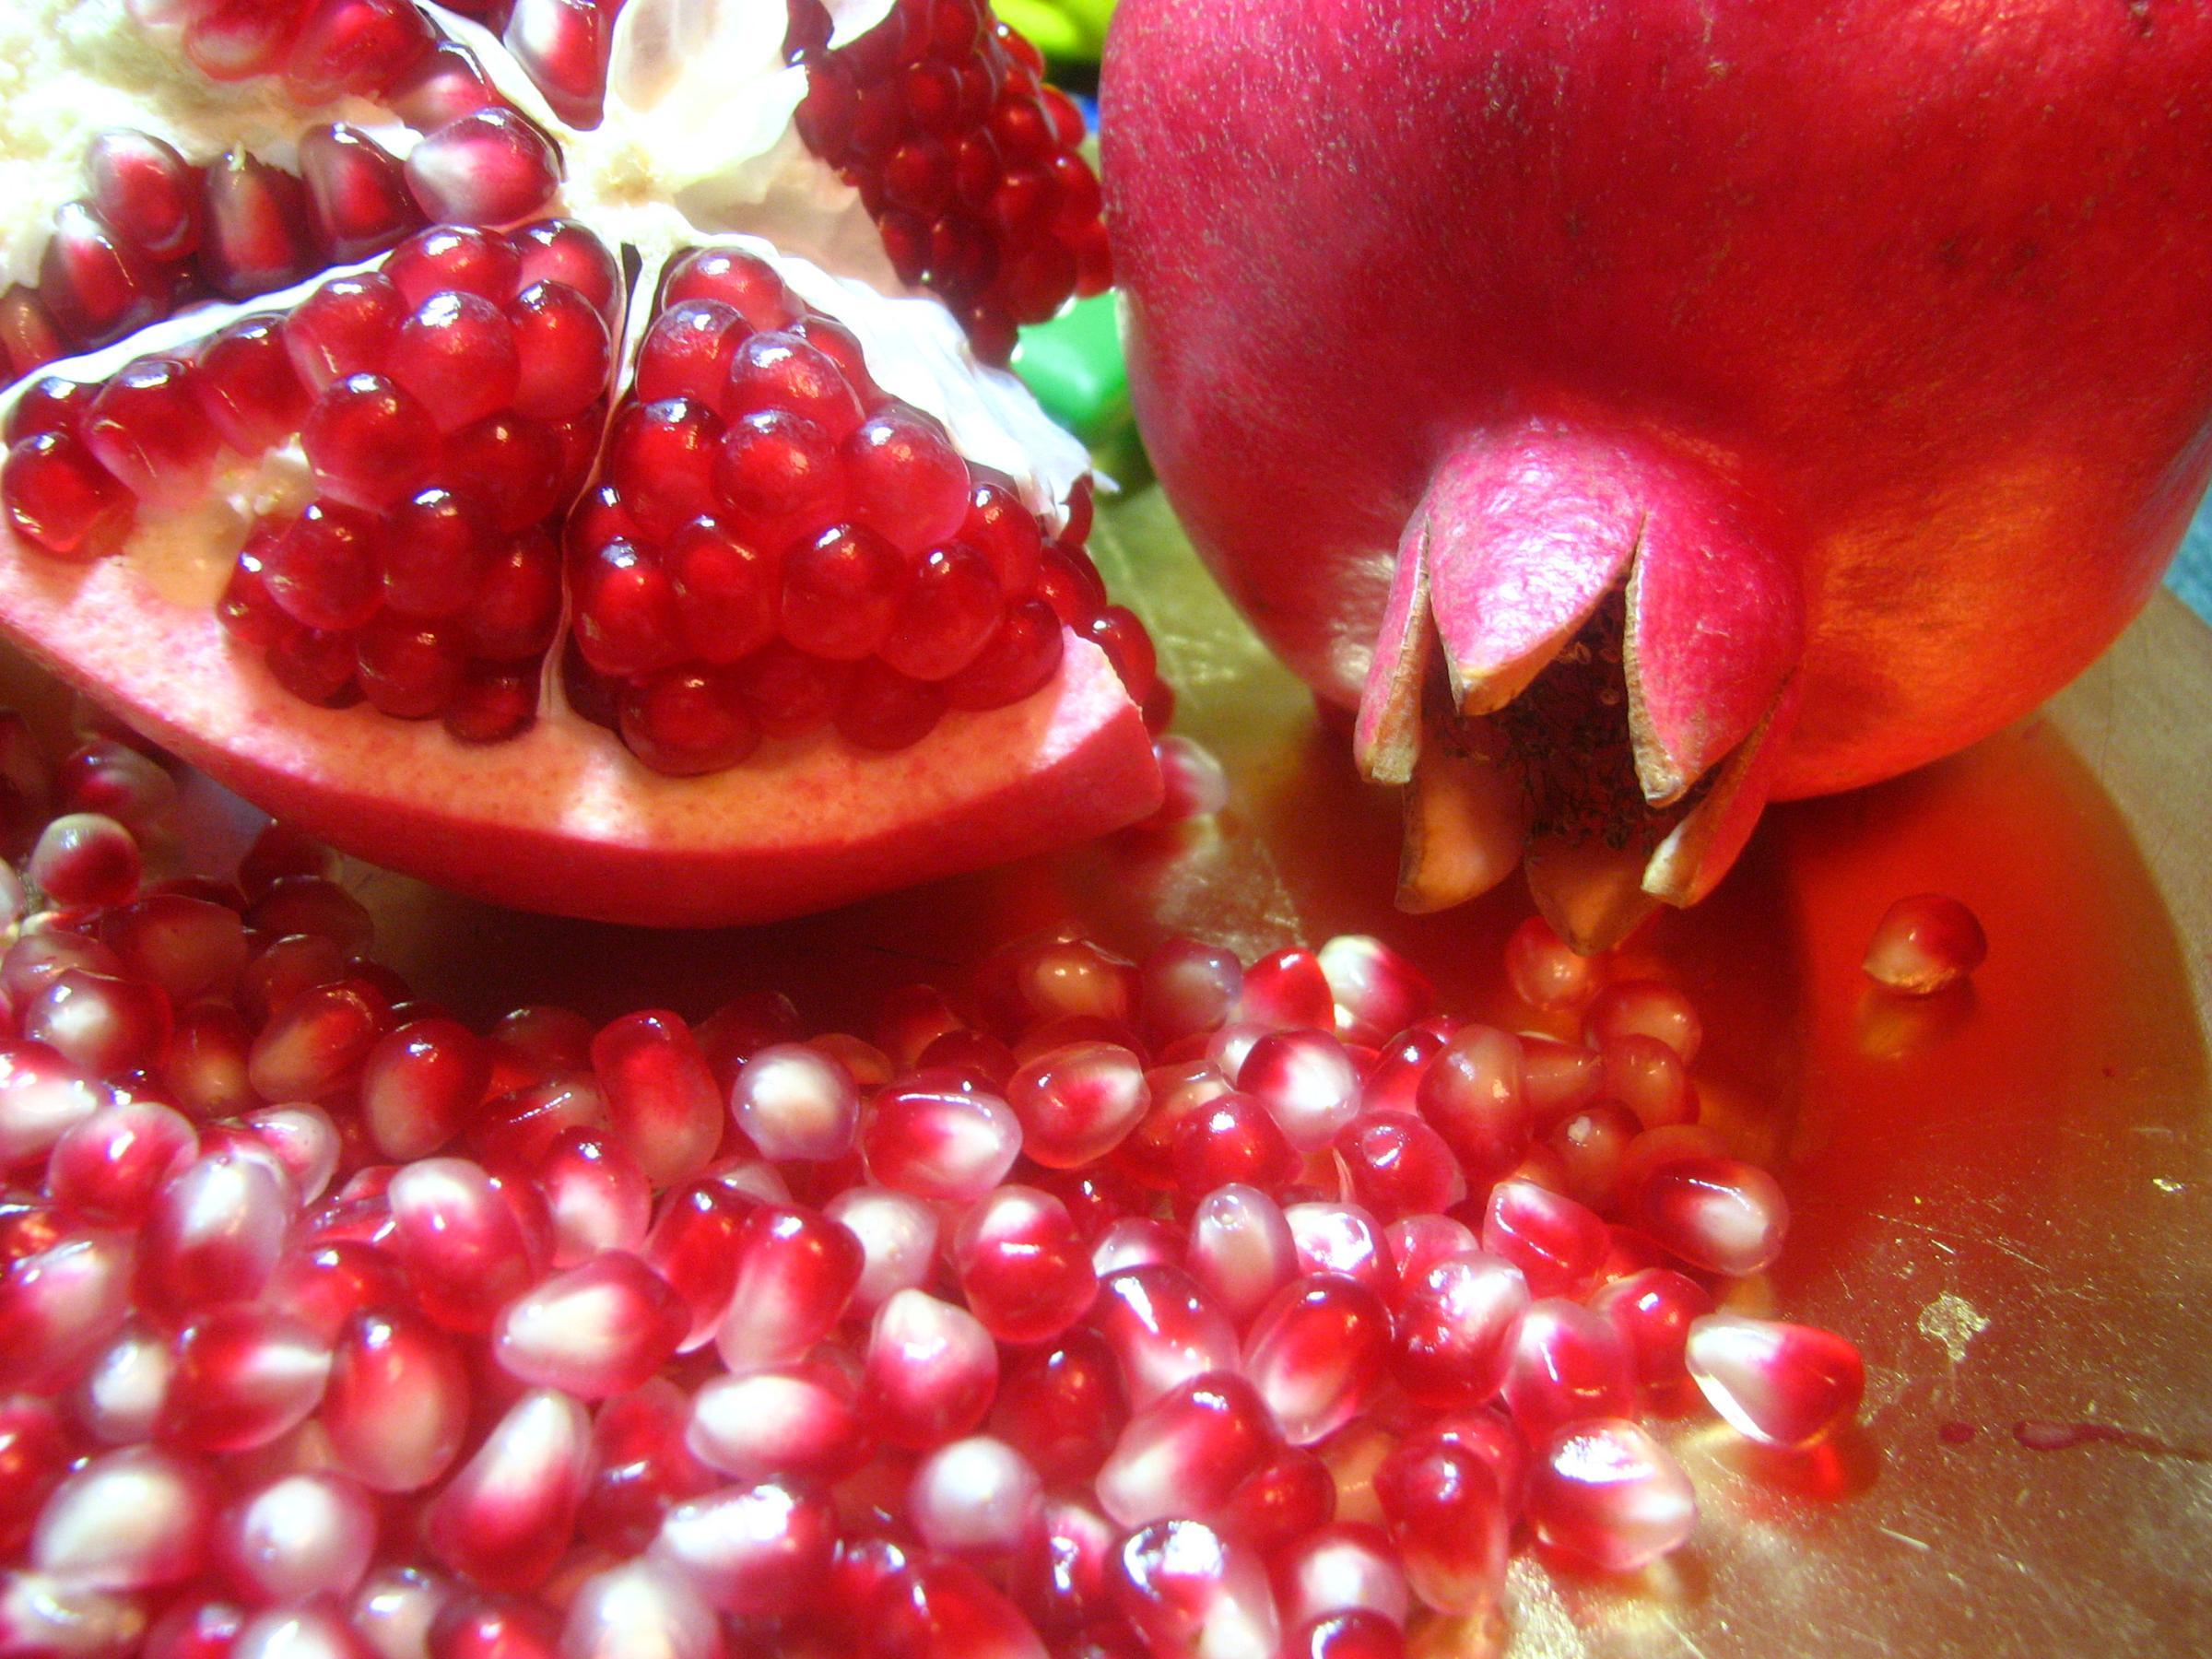 Cool Pomegranate Fruit Wallpaper Desktop Wallpaper with 2400x1800 2400x1800